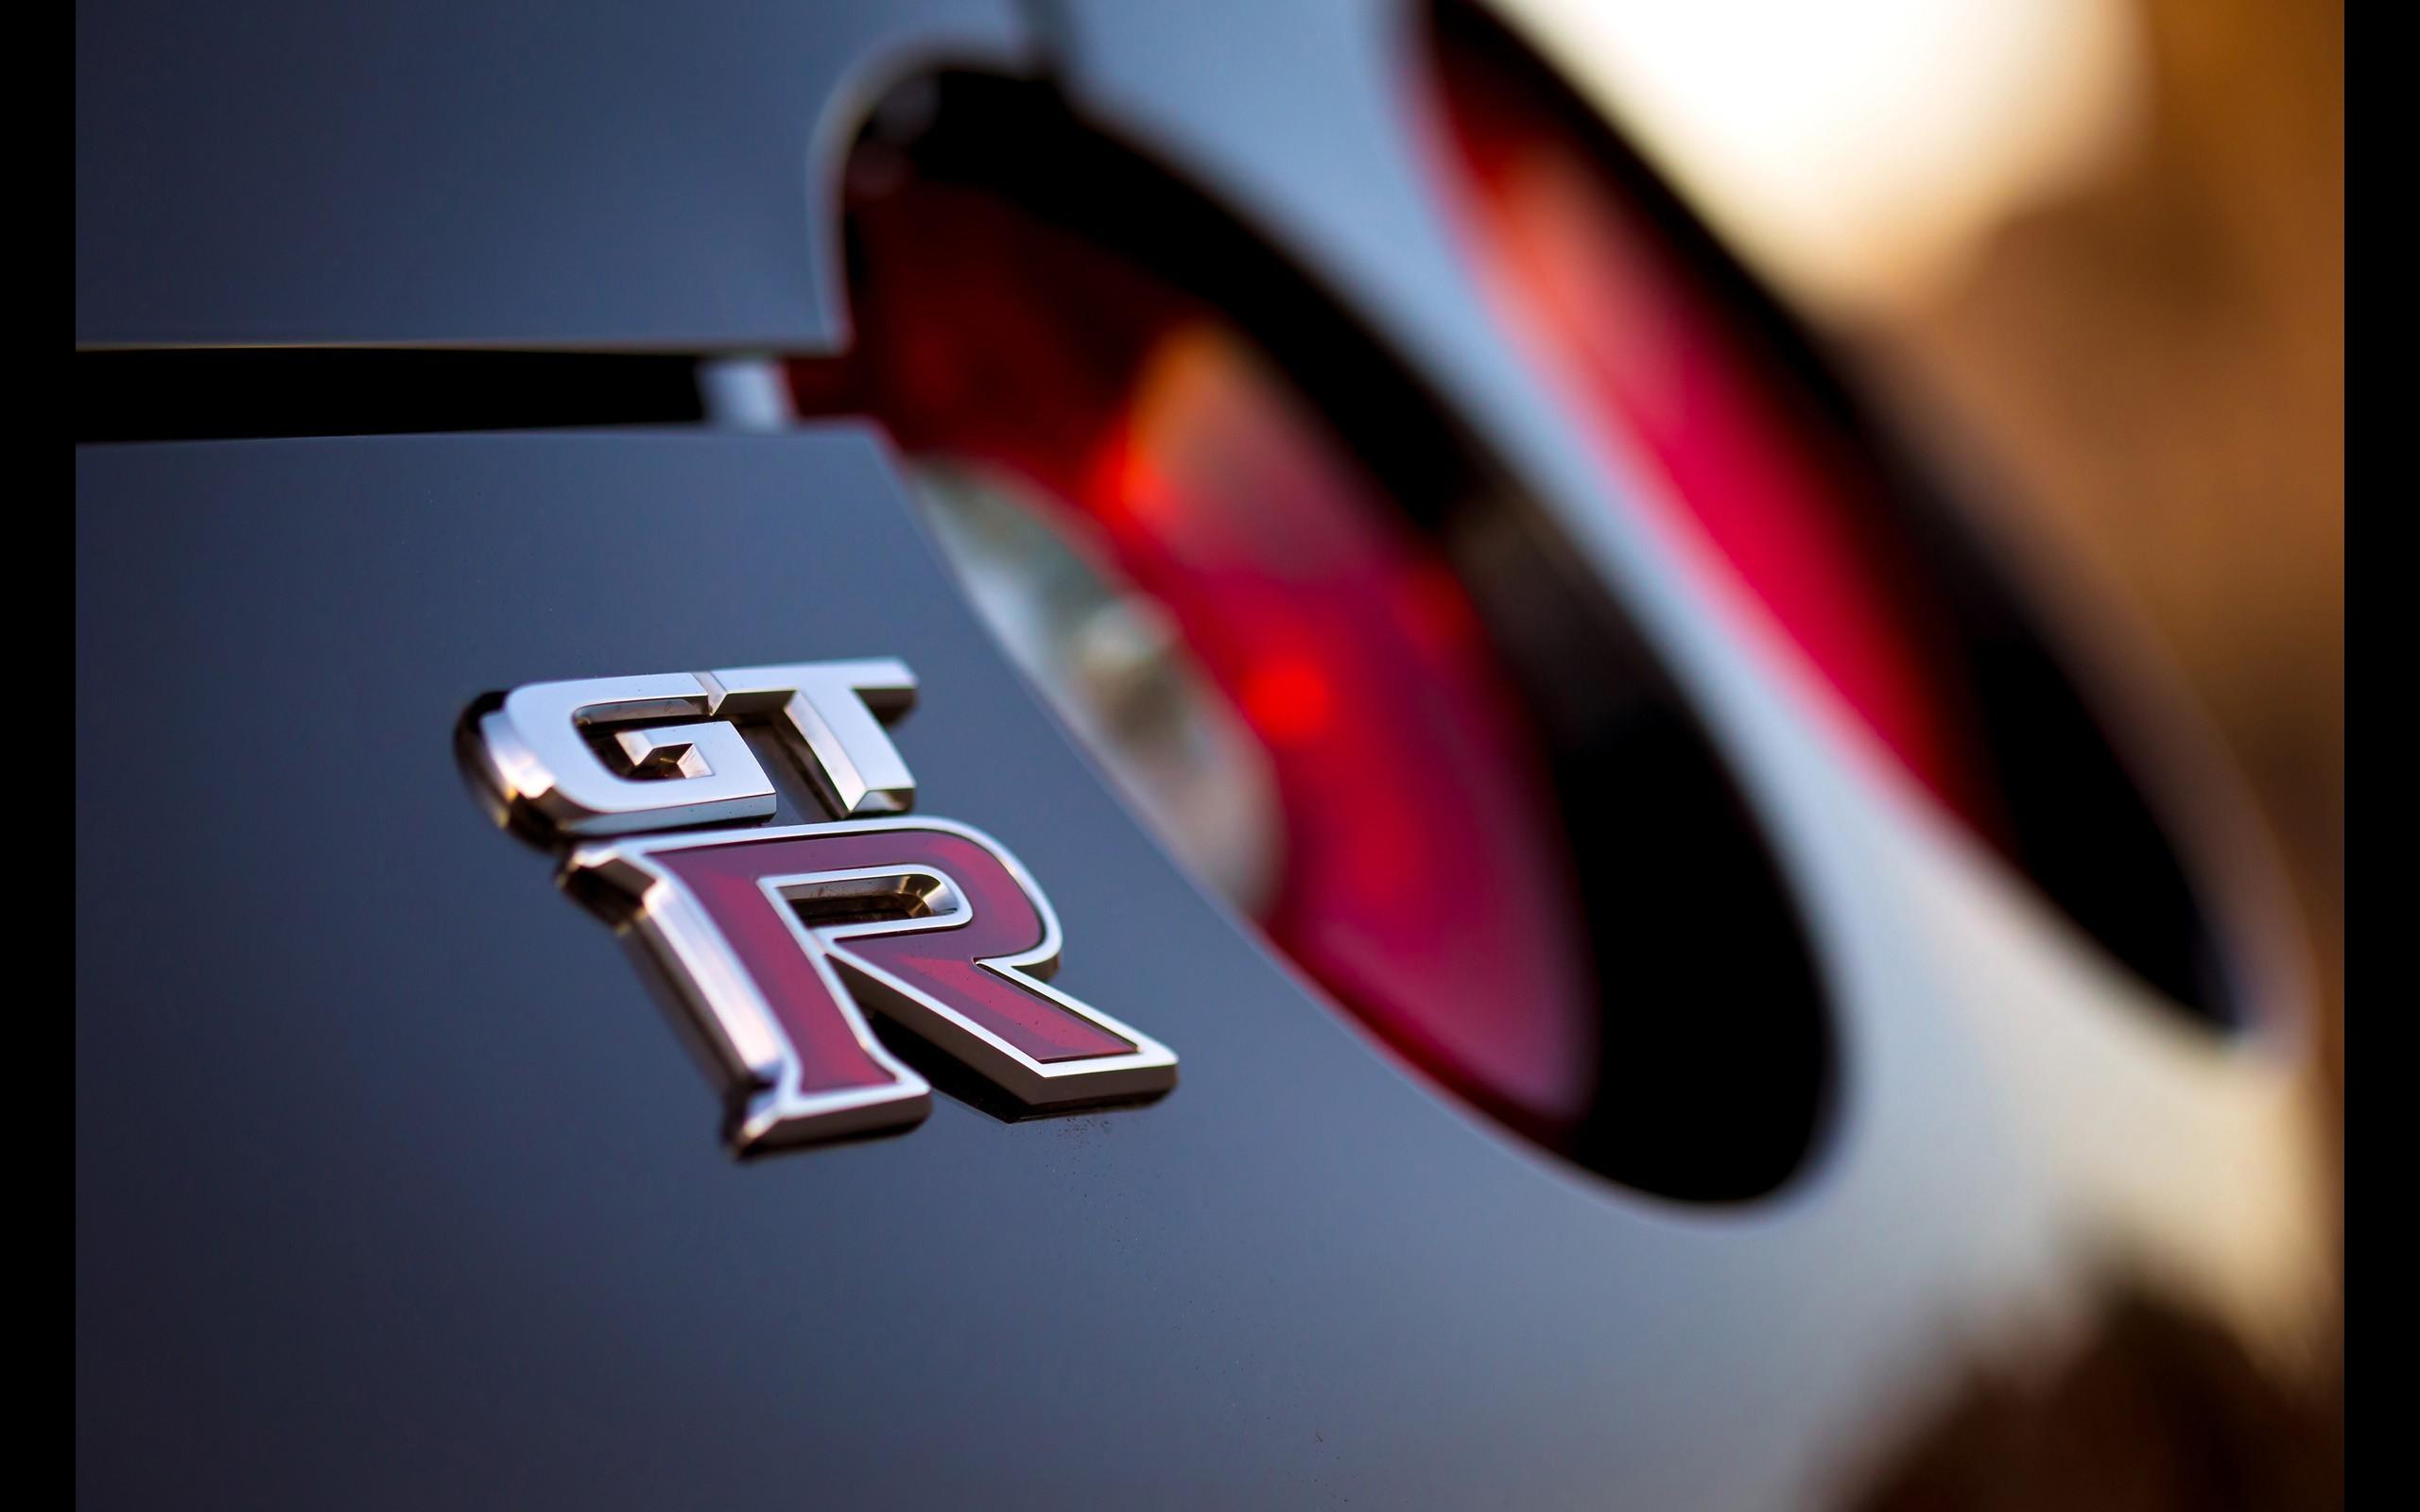 Nissan GT R wallpaper